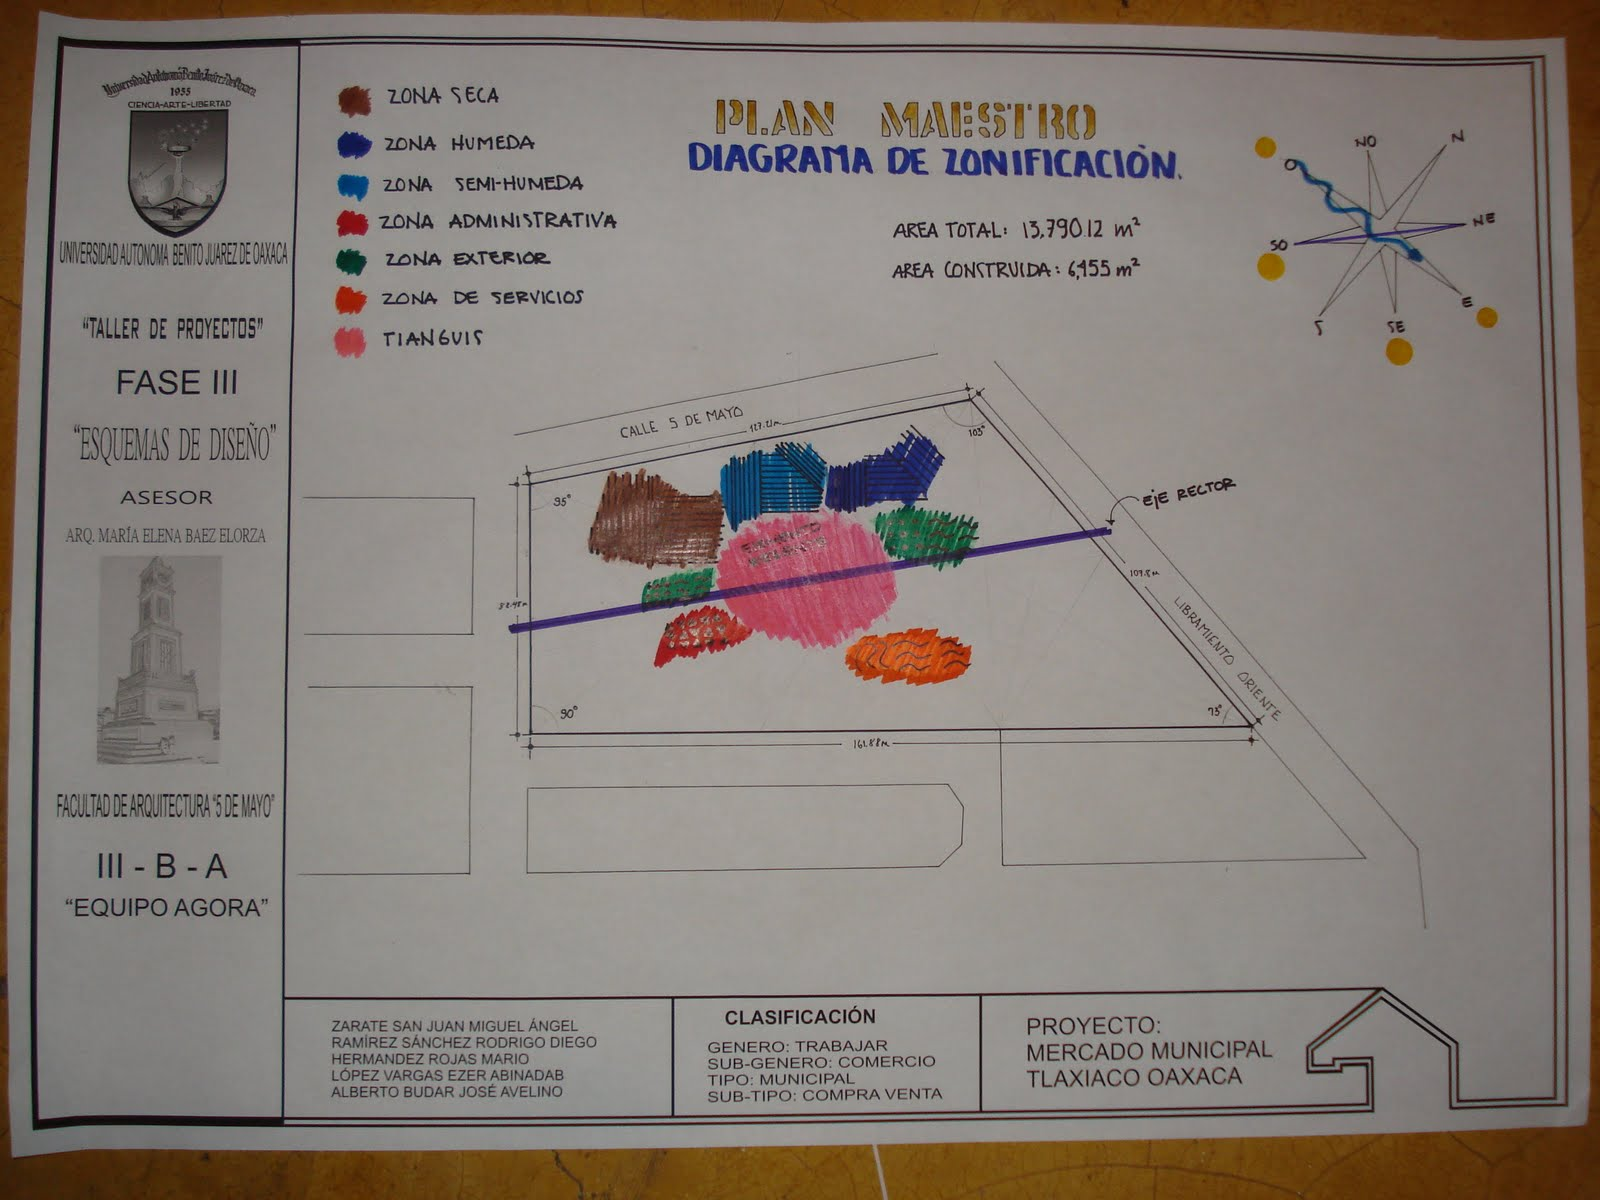 Dise o arquitect nico de un mercado municipal en tlaxiaco for Biblioteca programa arquitectonico